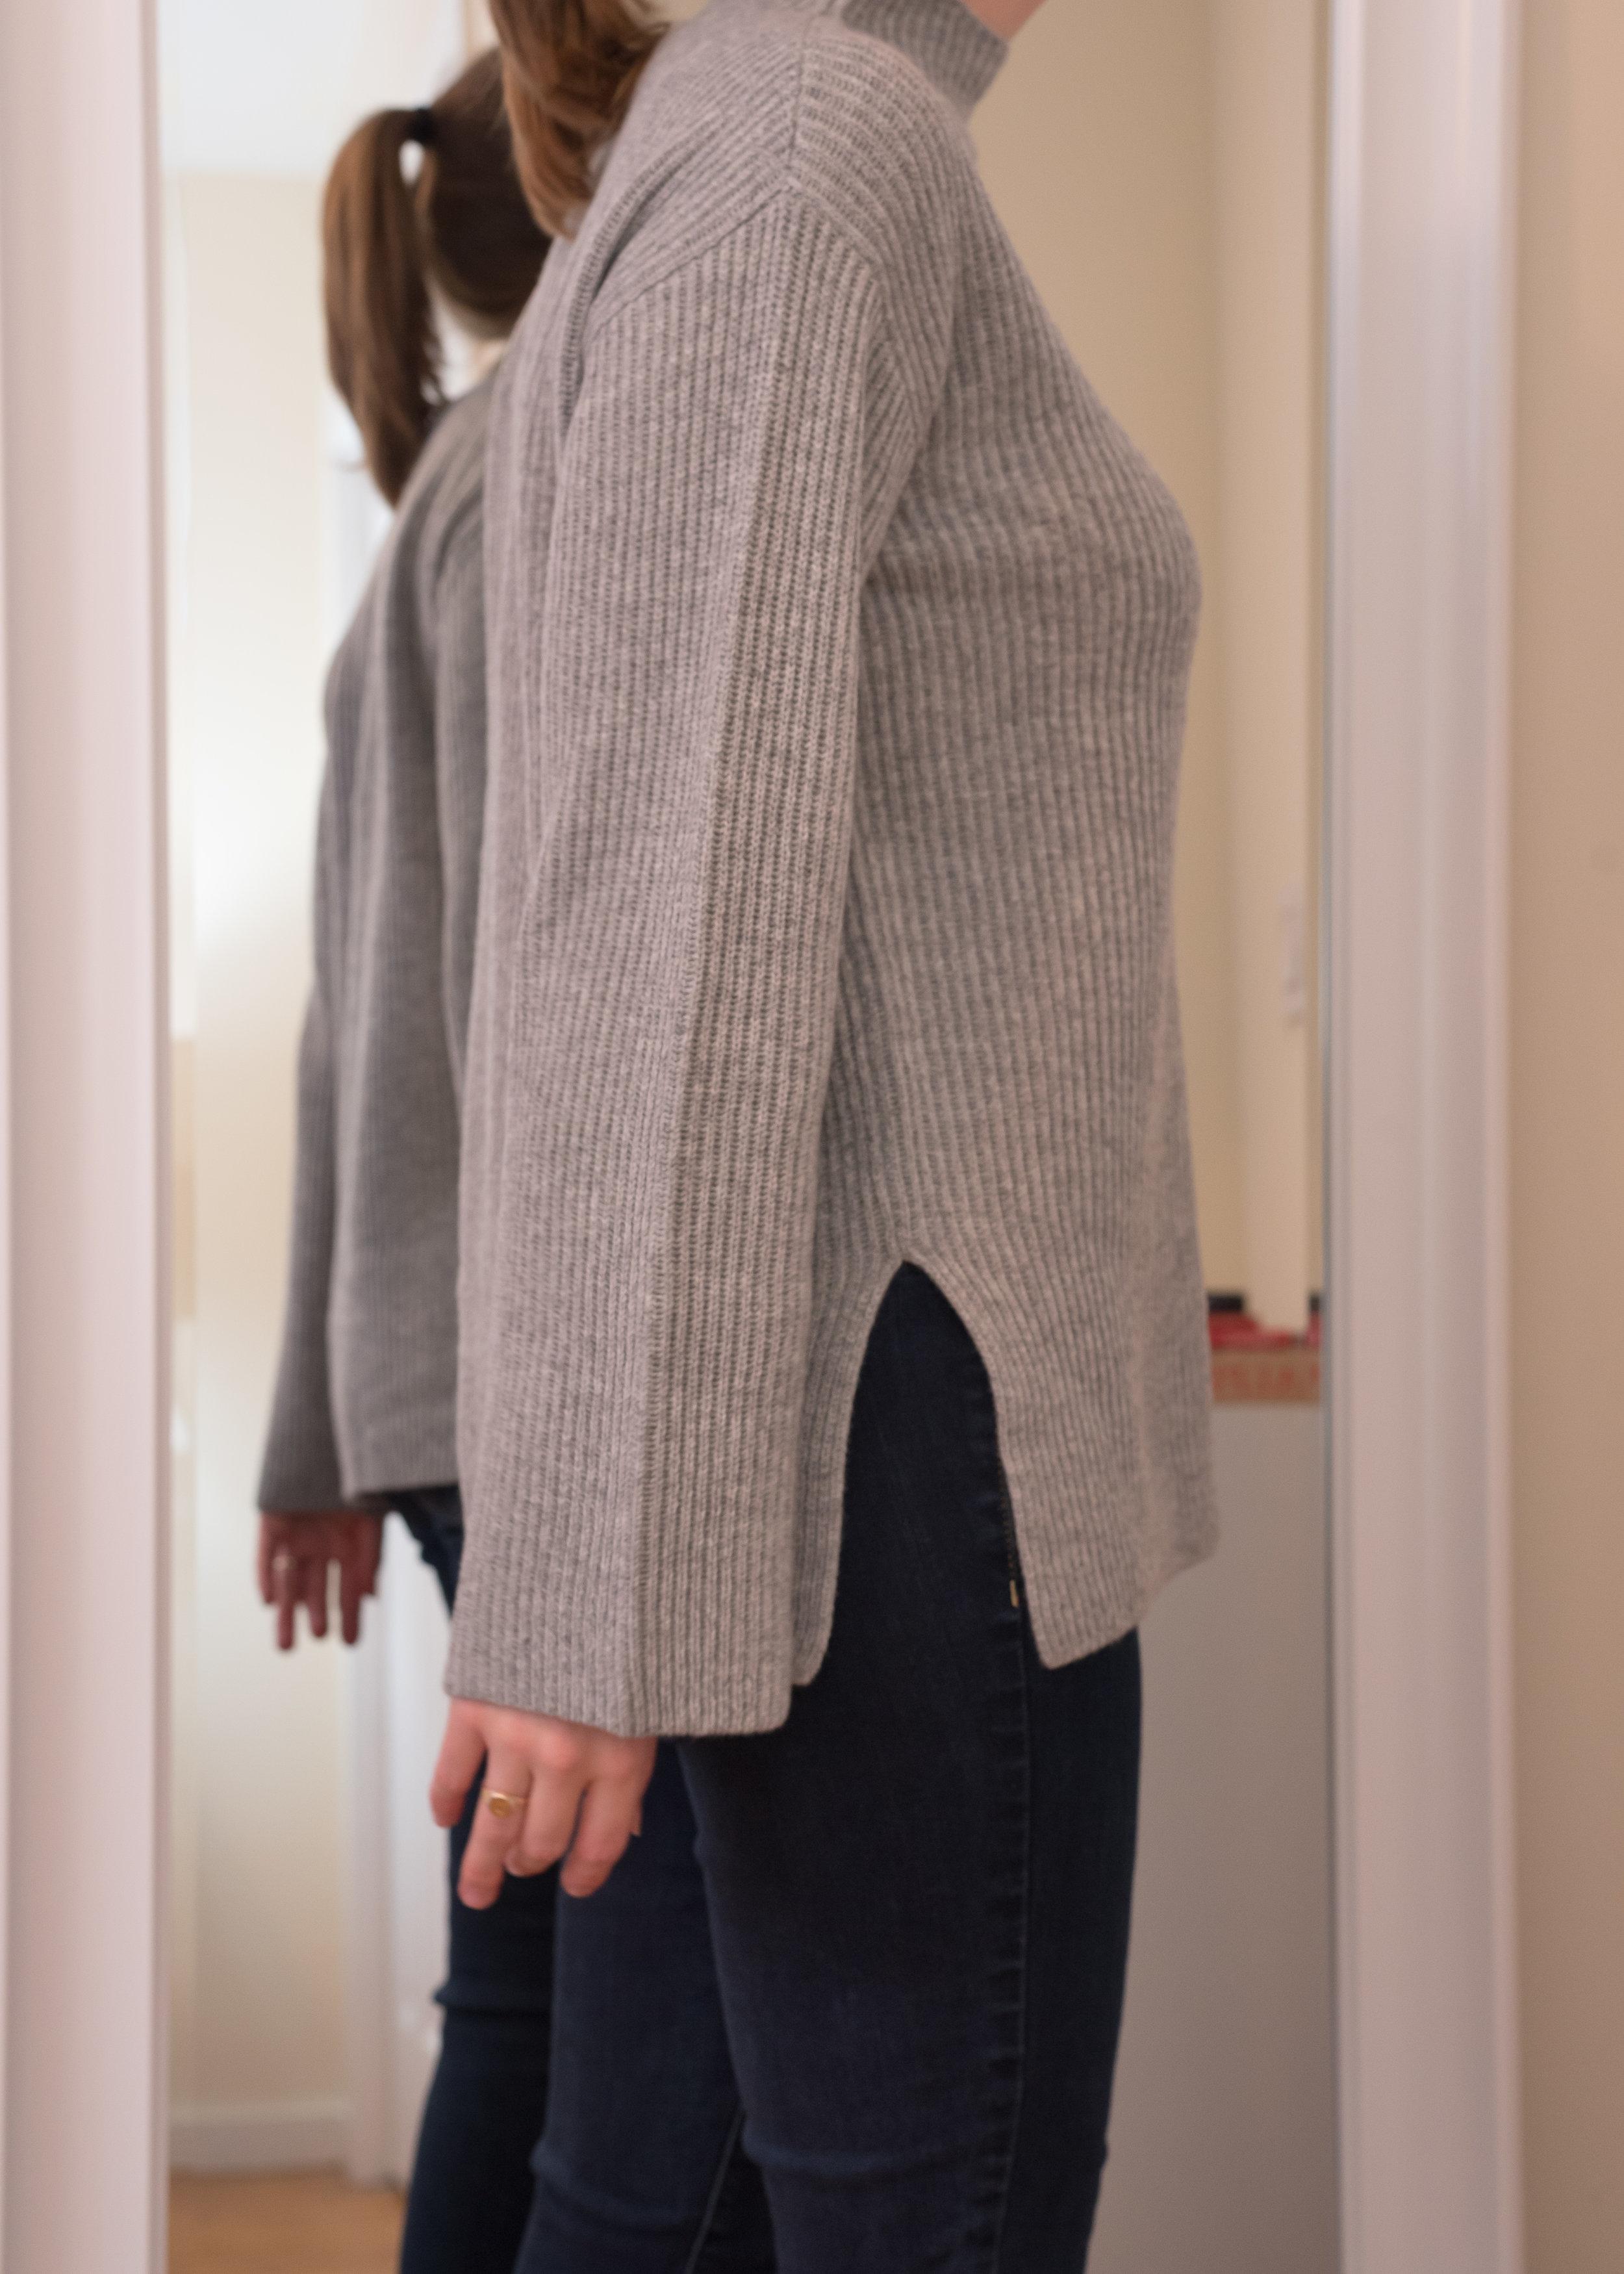 Everlane Cashmere Rib Mockneck Sweater - Size S - Side View